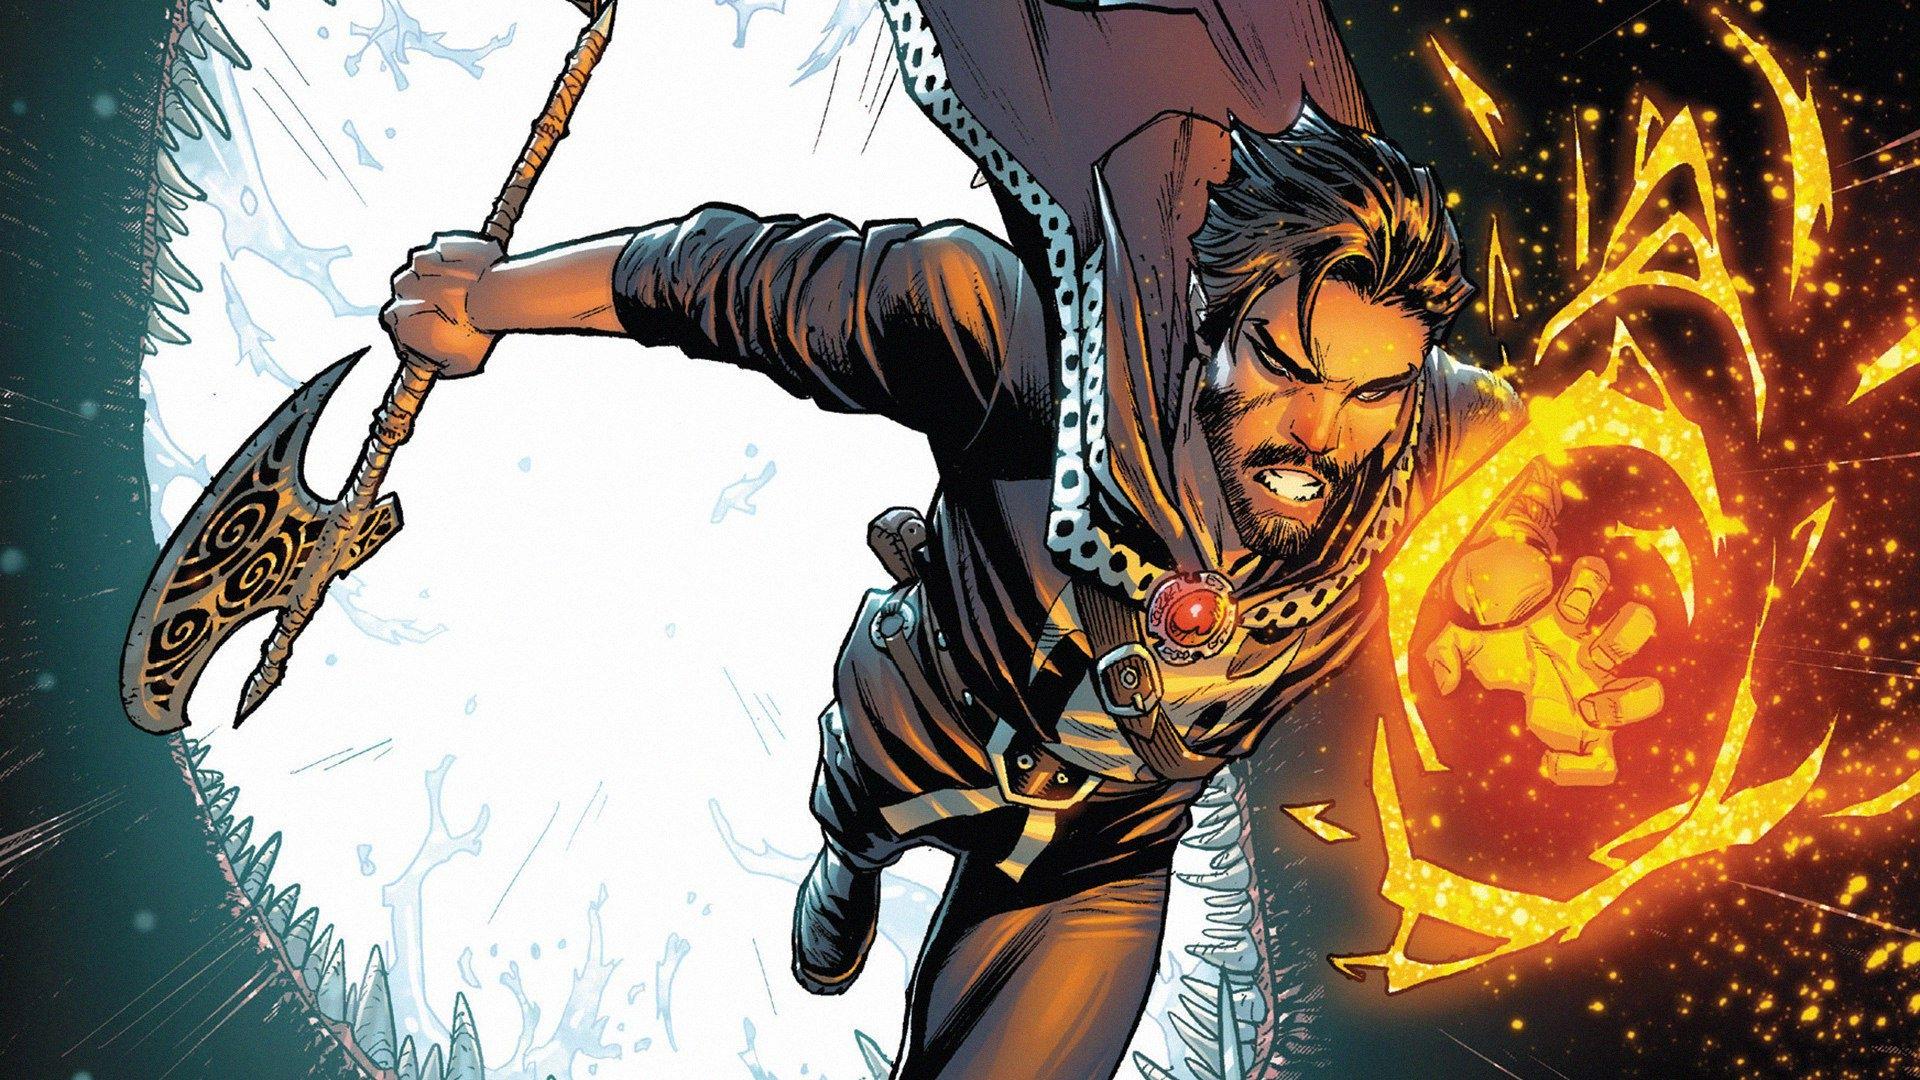 Doctor Strange Superhero Comic Art Wallpaper, HD ...